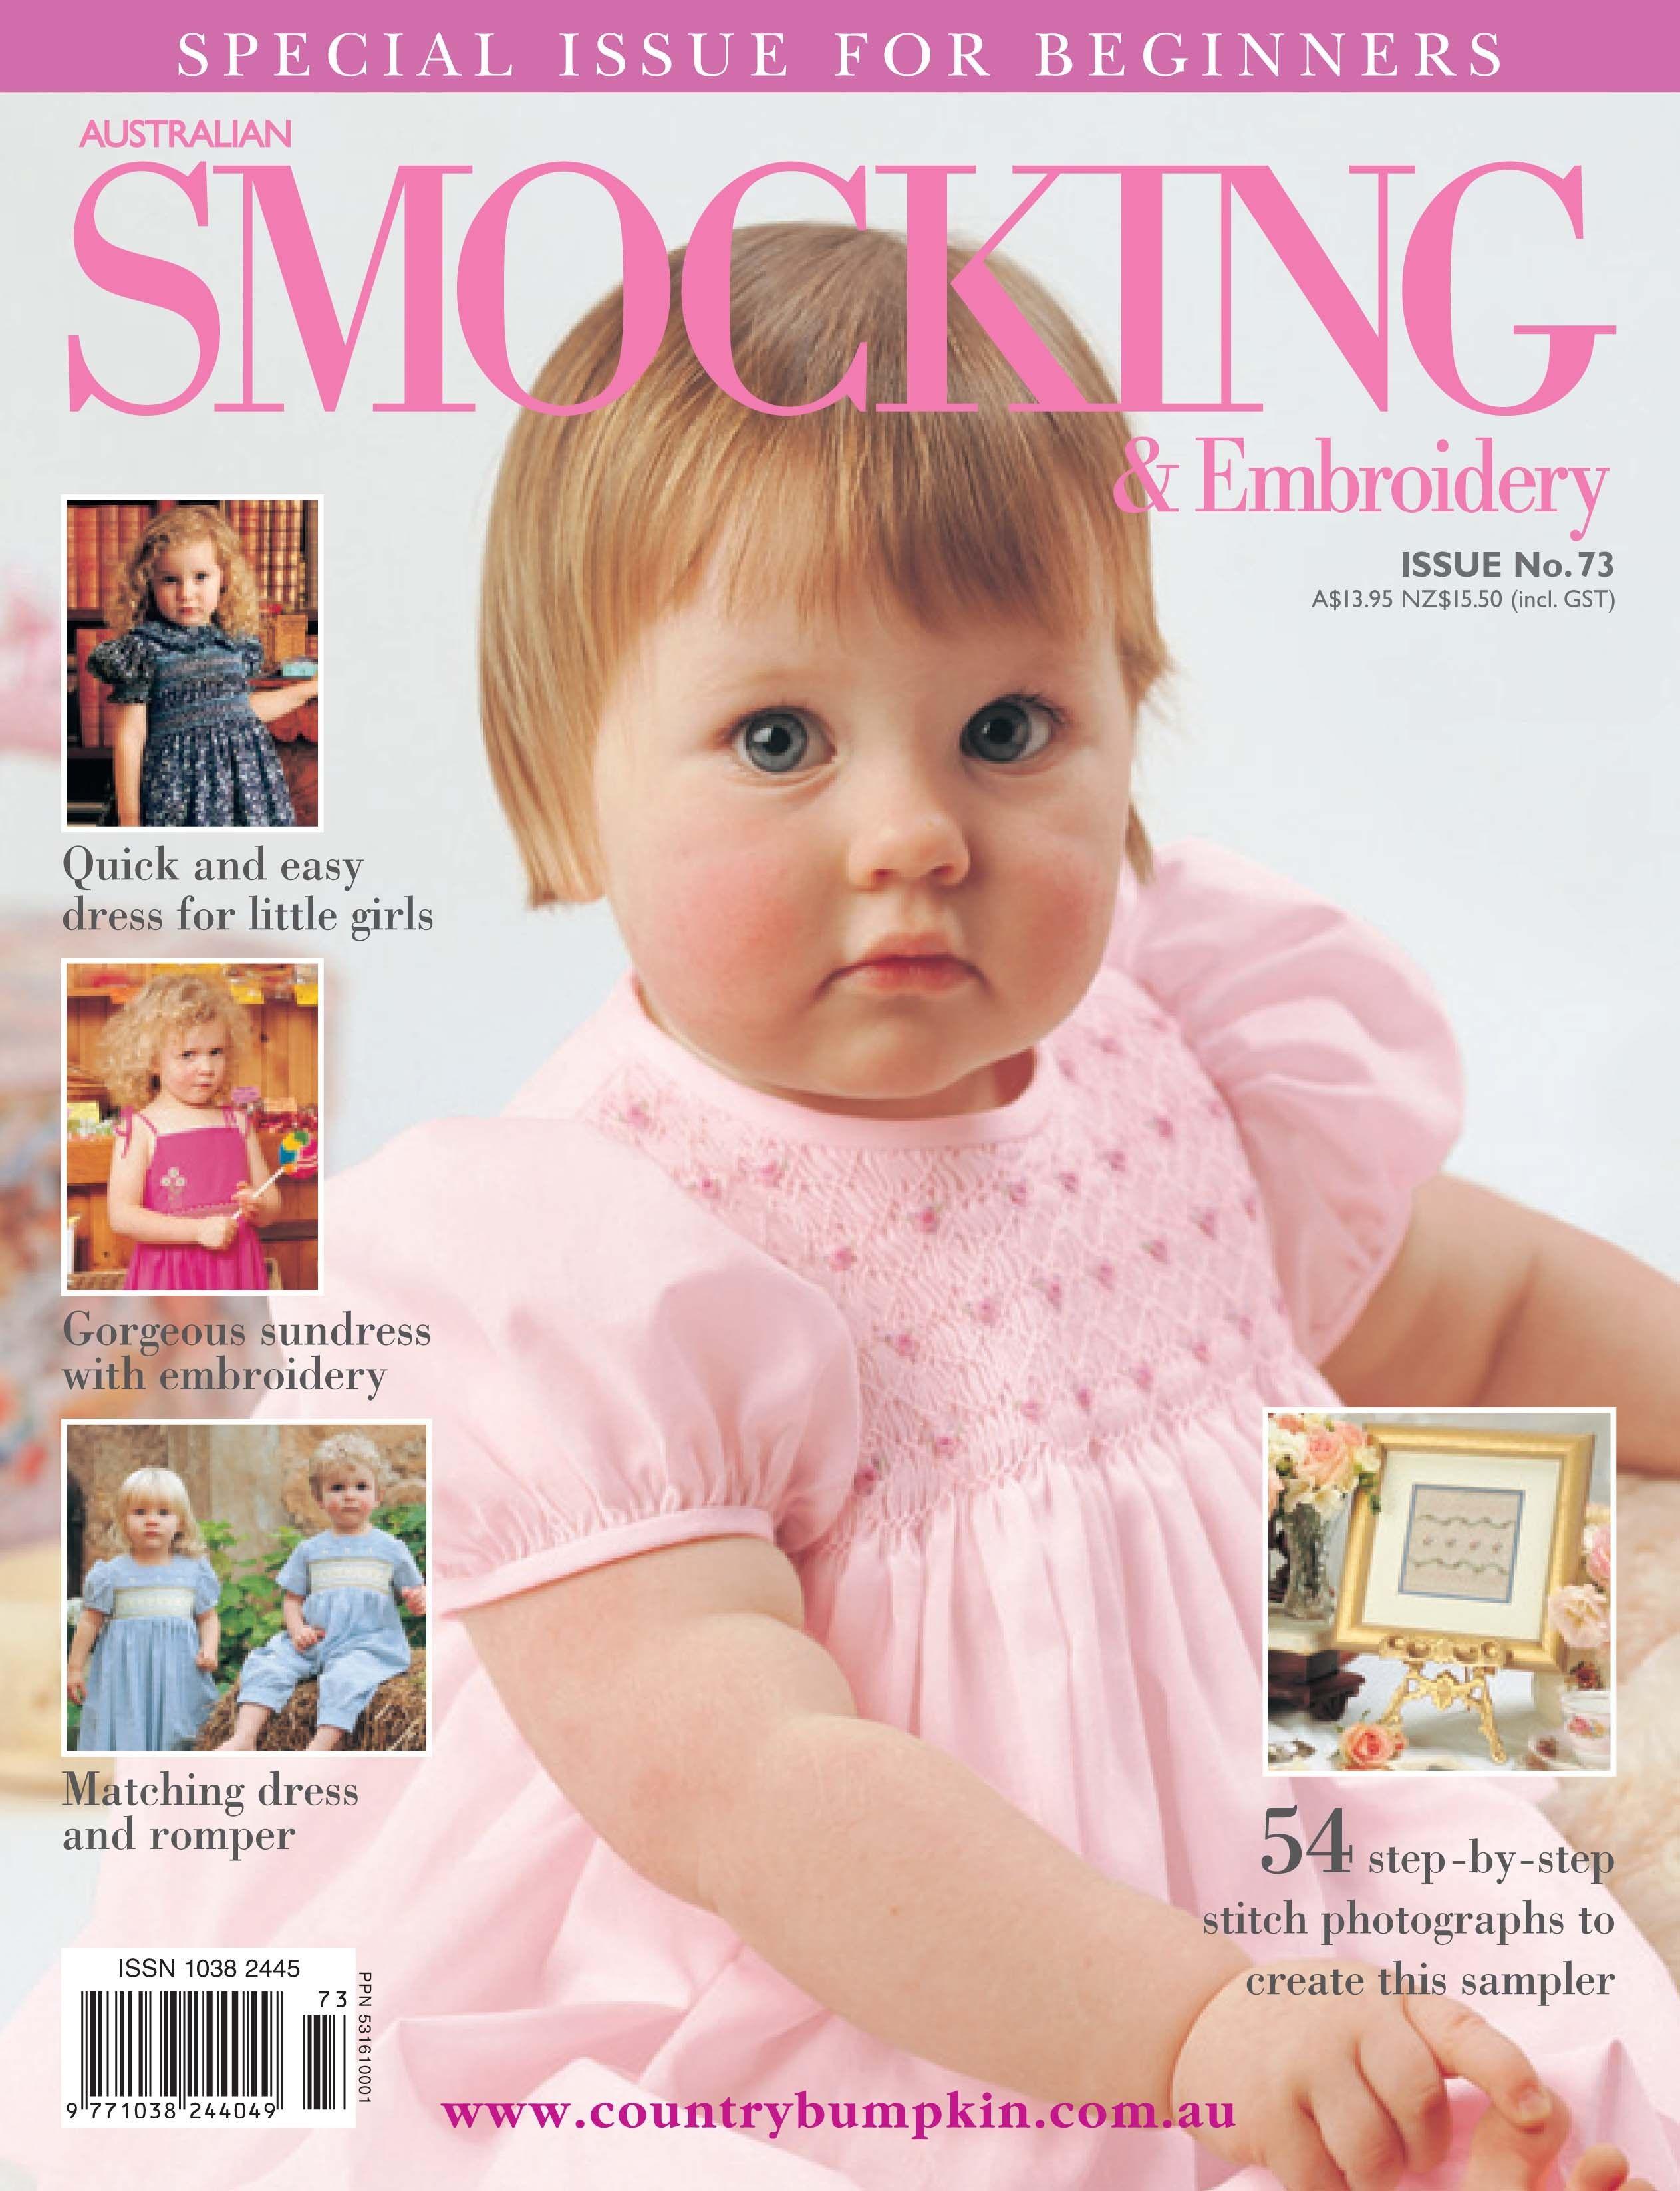 Issue 73 - Australian Smocking & Embroidery Magazine